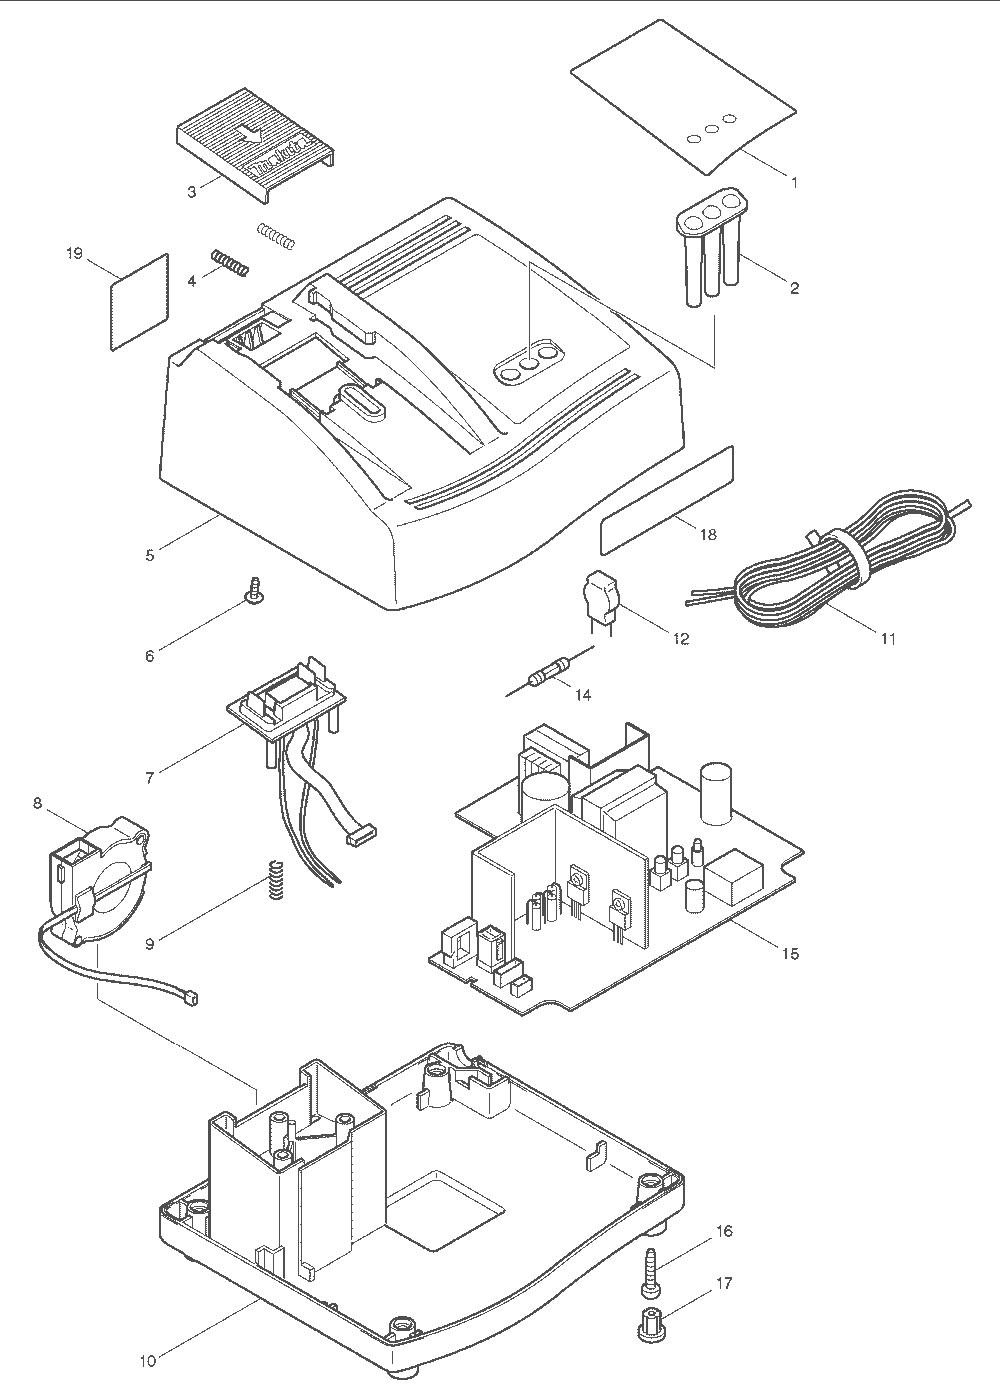 Kawasaki Brute 650 Wiring Diagram Mercury Outboard 115 HP